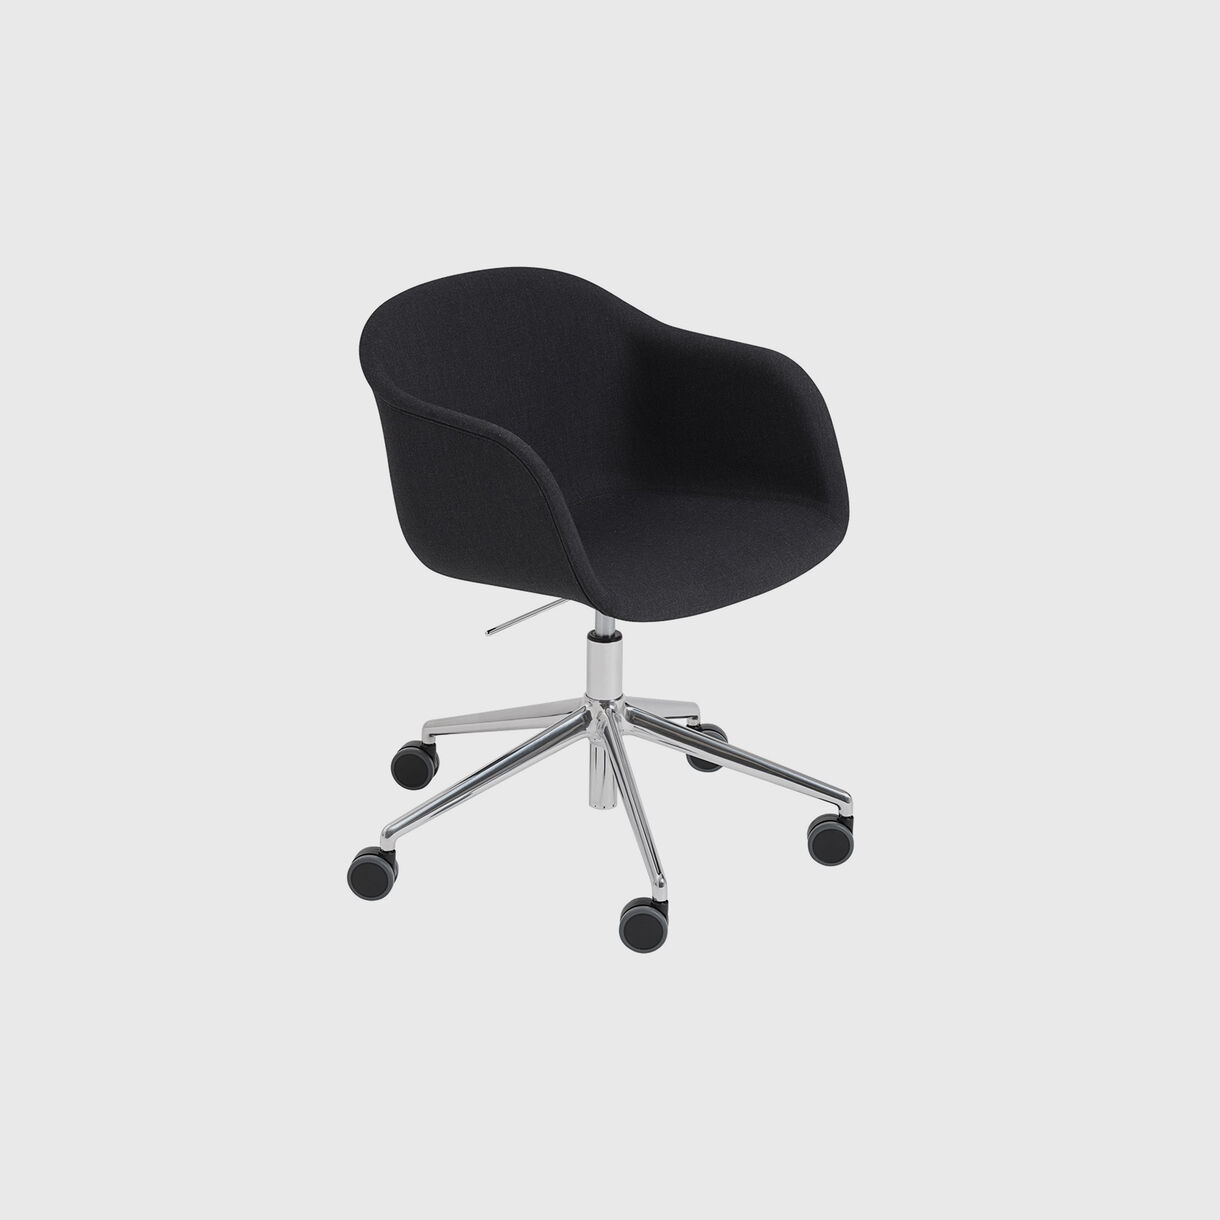 Fiber Armchair Upholstered, Remix 183 & Chrome, Swivel Base with Castors & Gas Lift, Grey